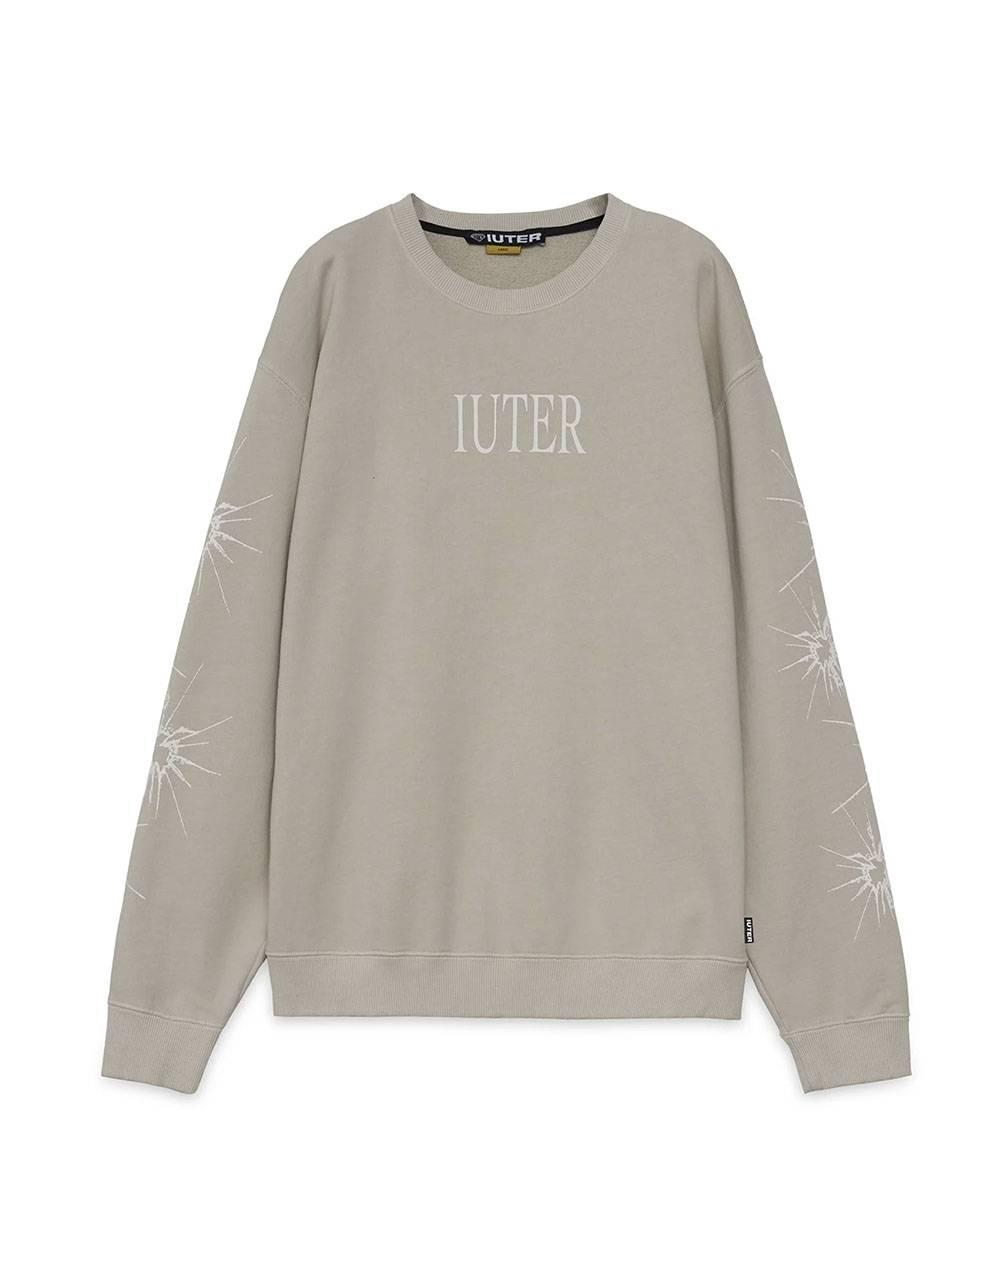 Iuter Value crewneck sweater - Grey IUTER Sweater 81,15€